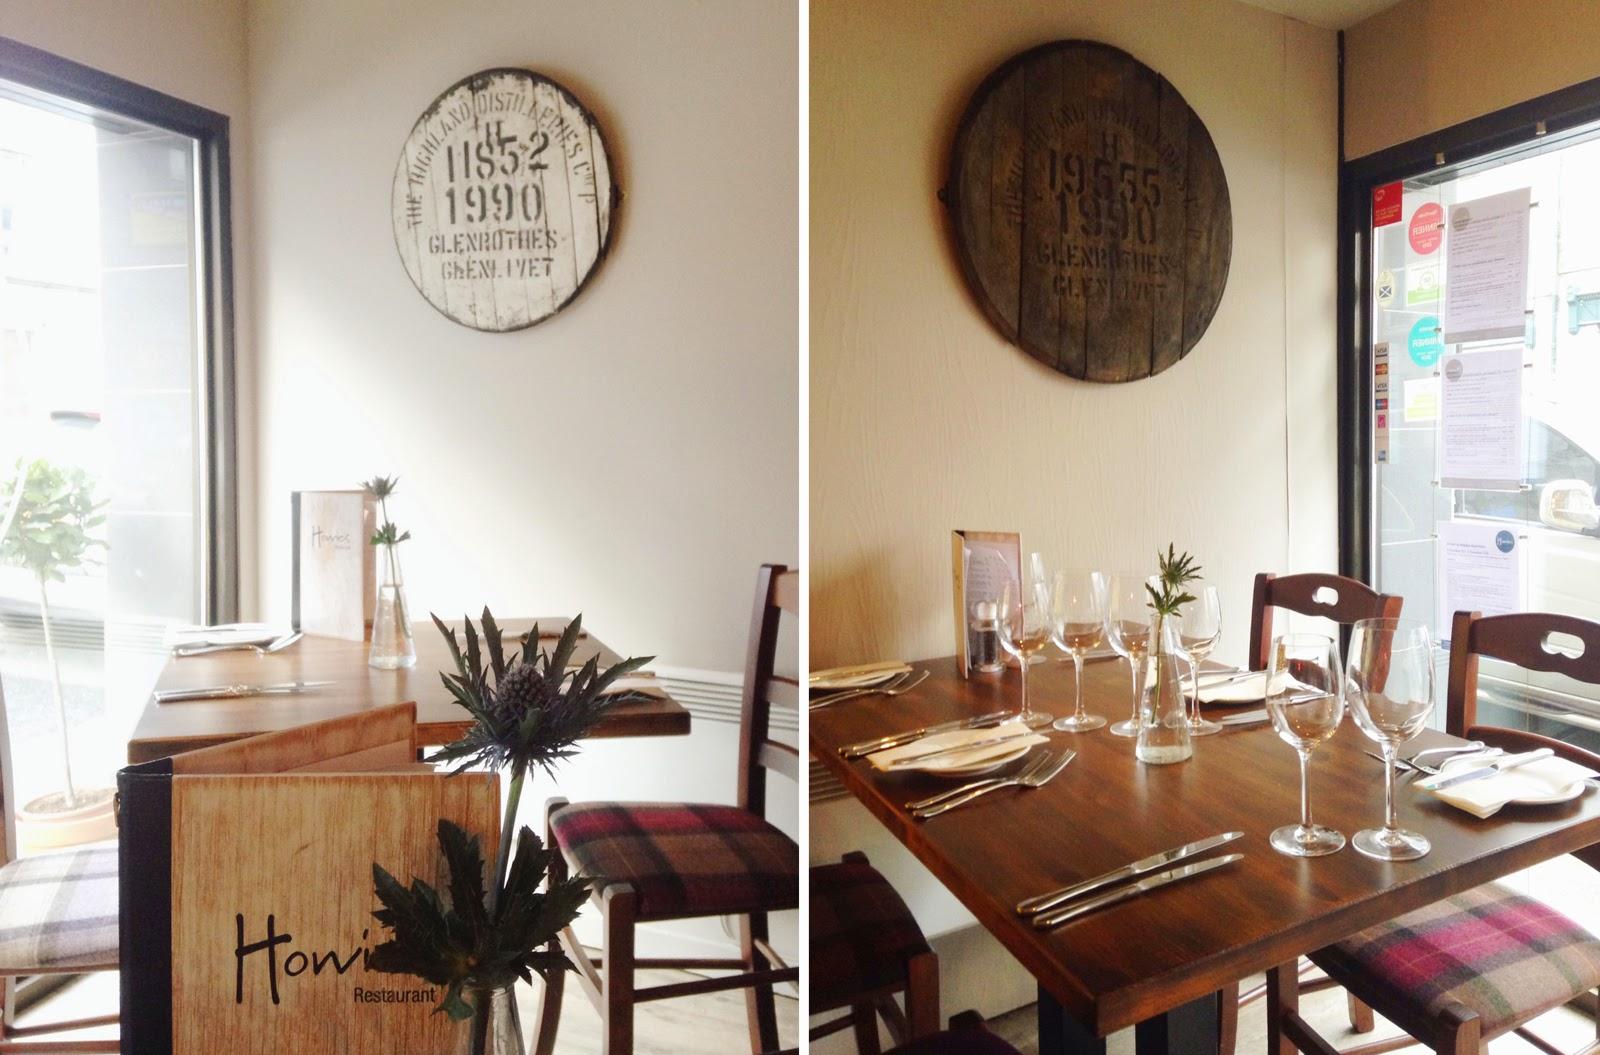 Howies restaurant Aberdeen